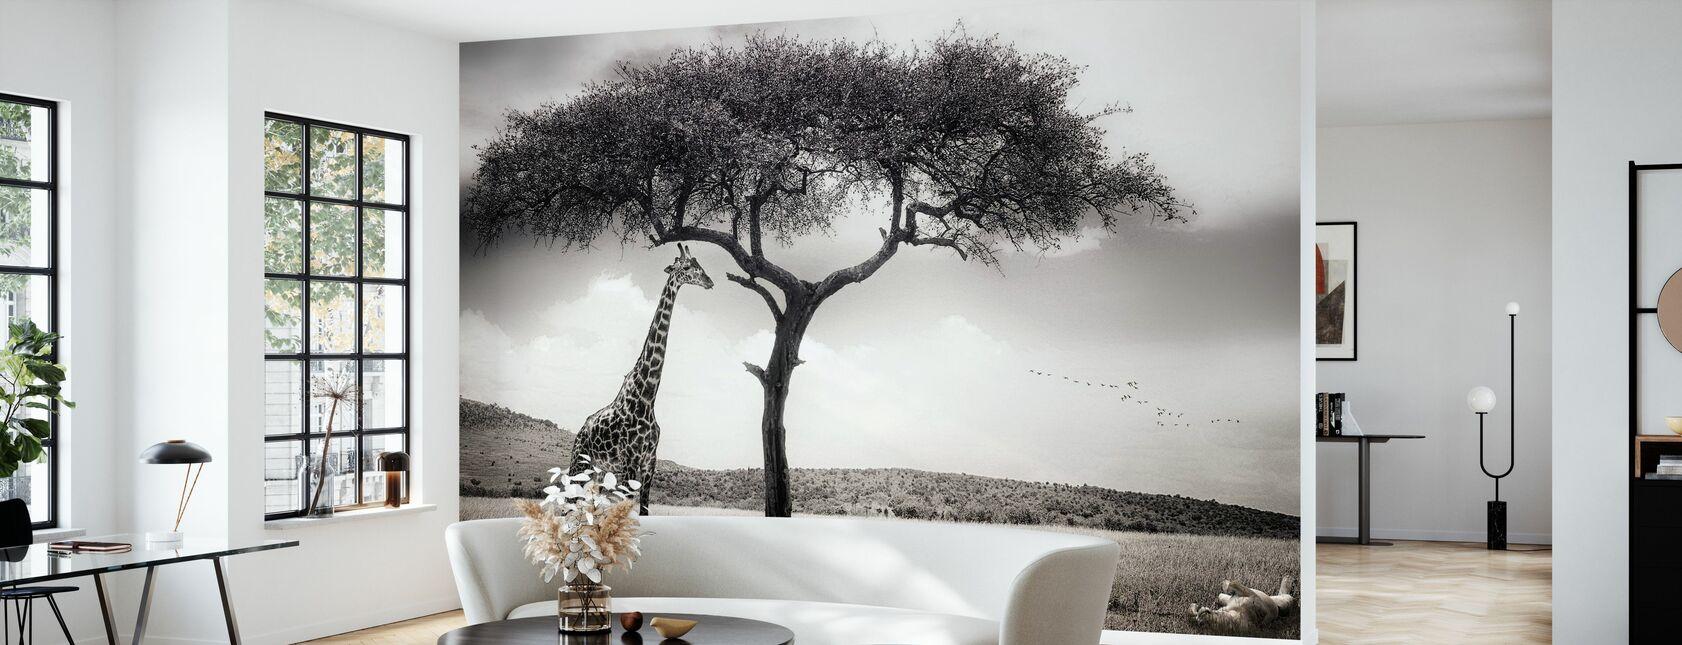 Under den afrikanske solen - Tapet - Stue